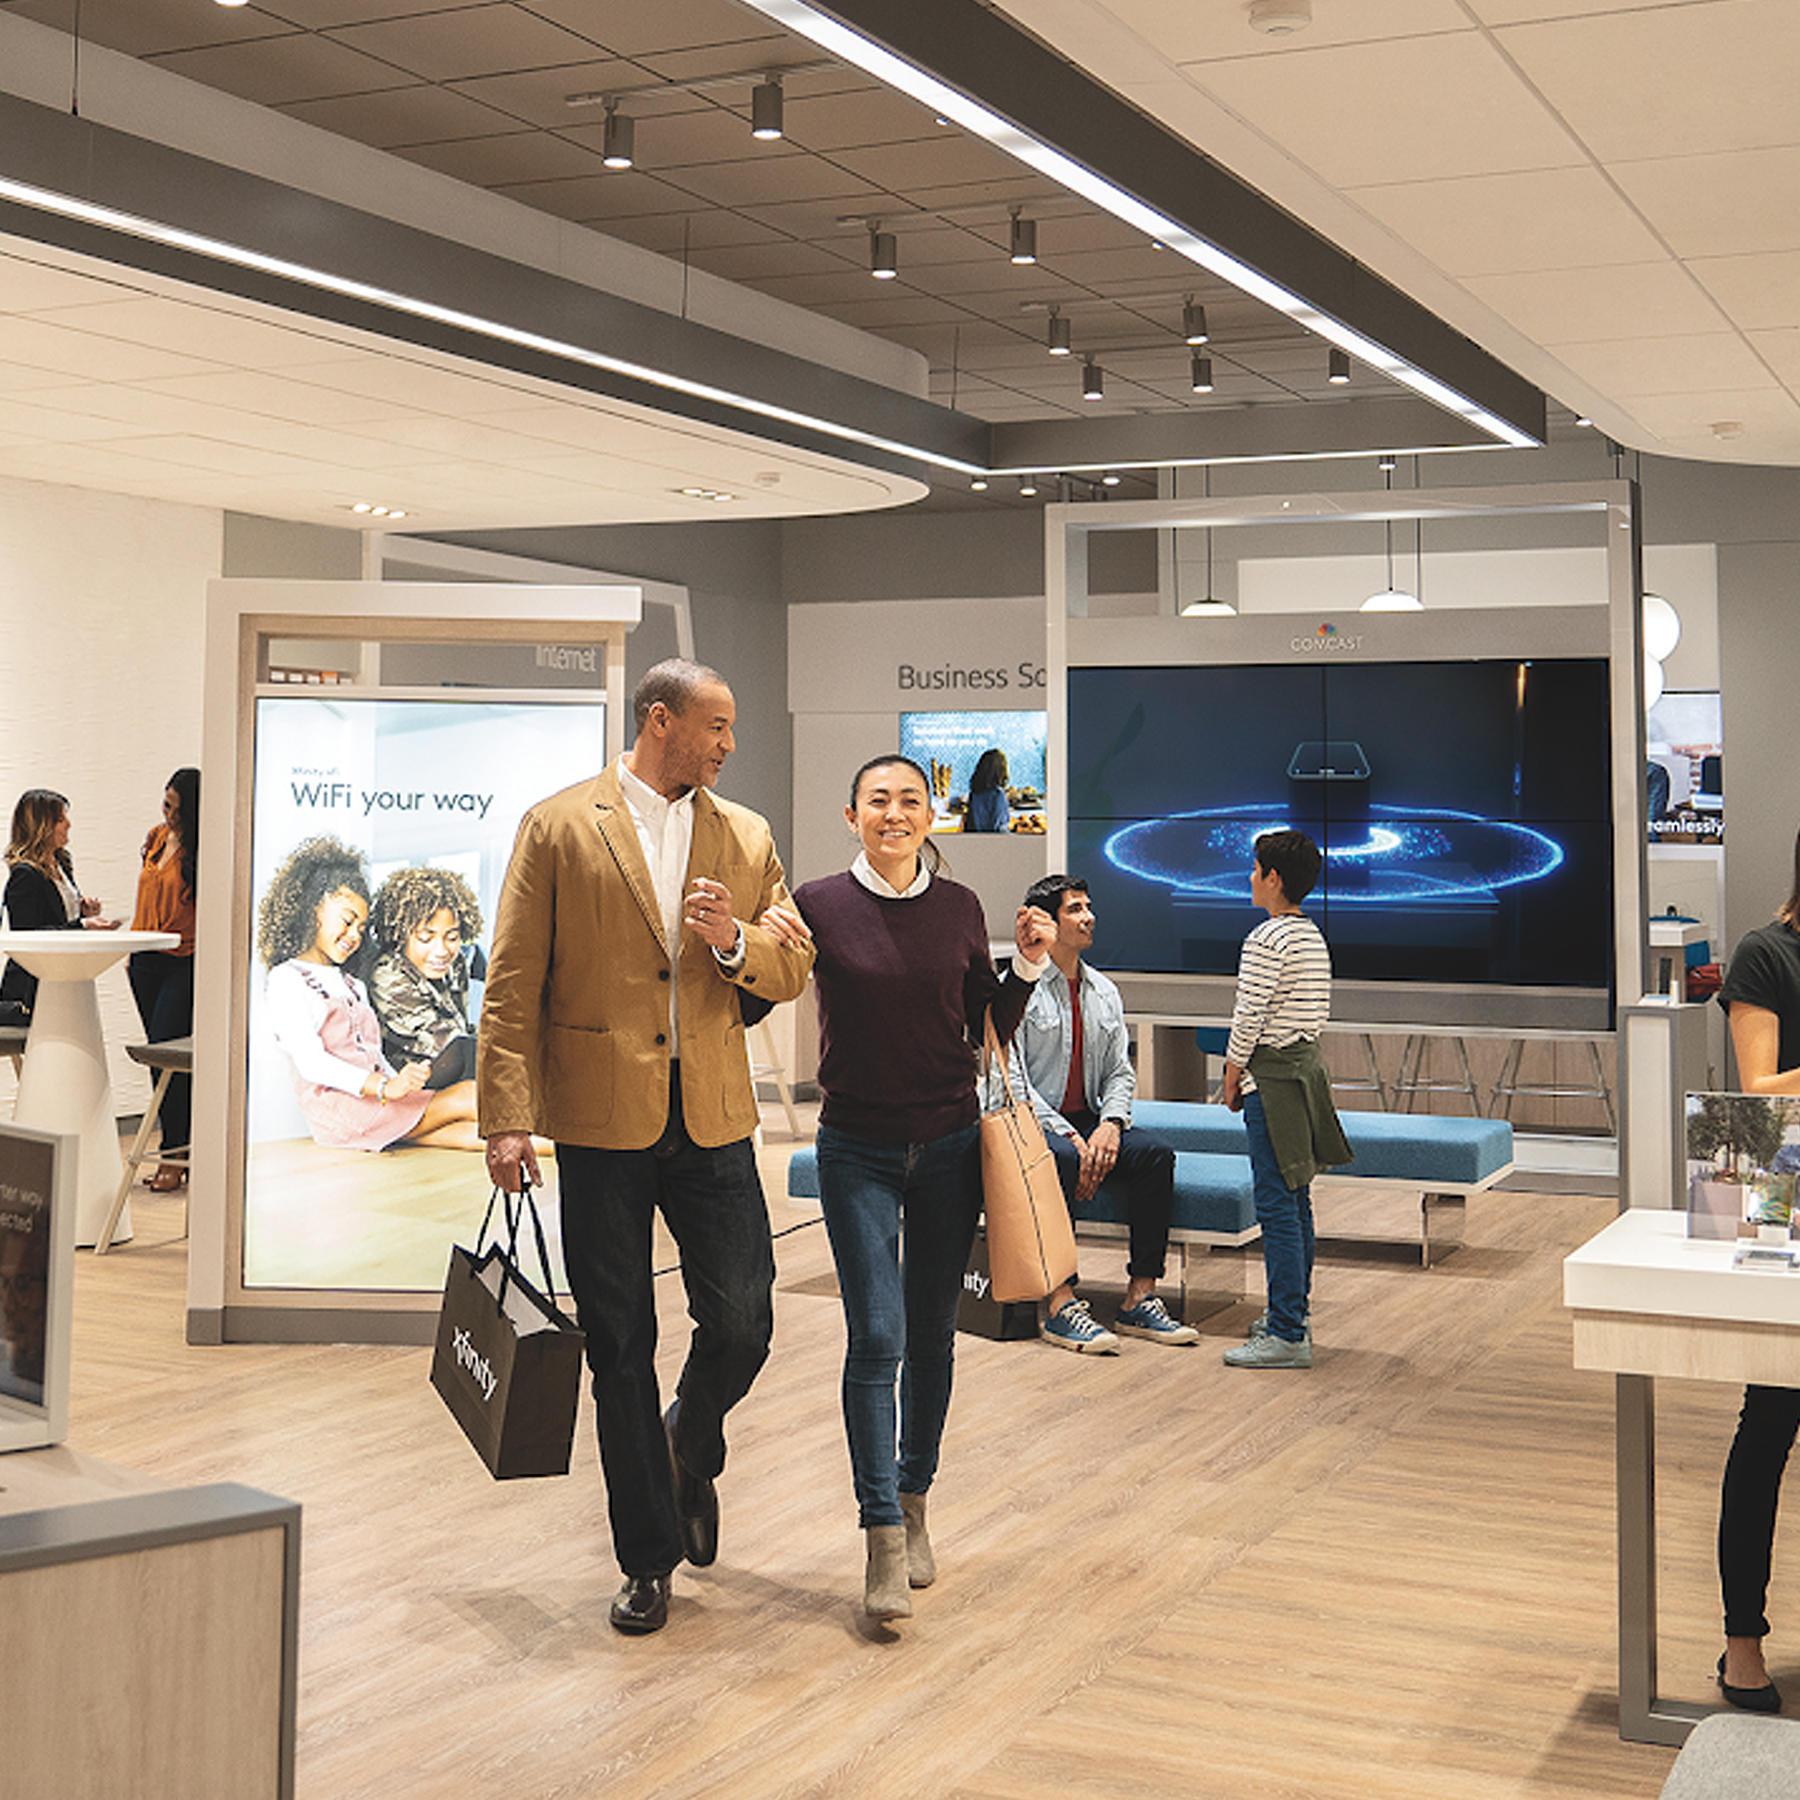 Xfinity Store By Comcast 3841 Route 42 Blackwood Nj 08012 Yp Com